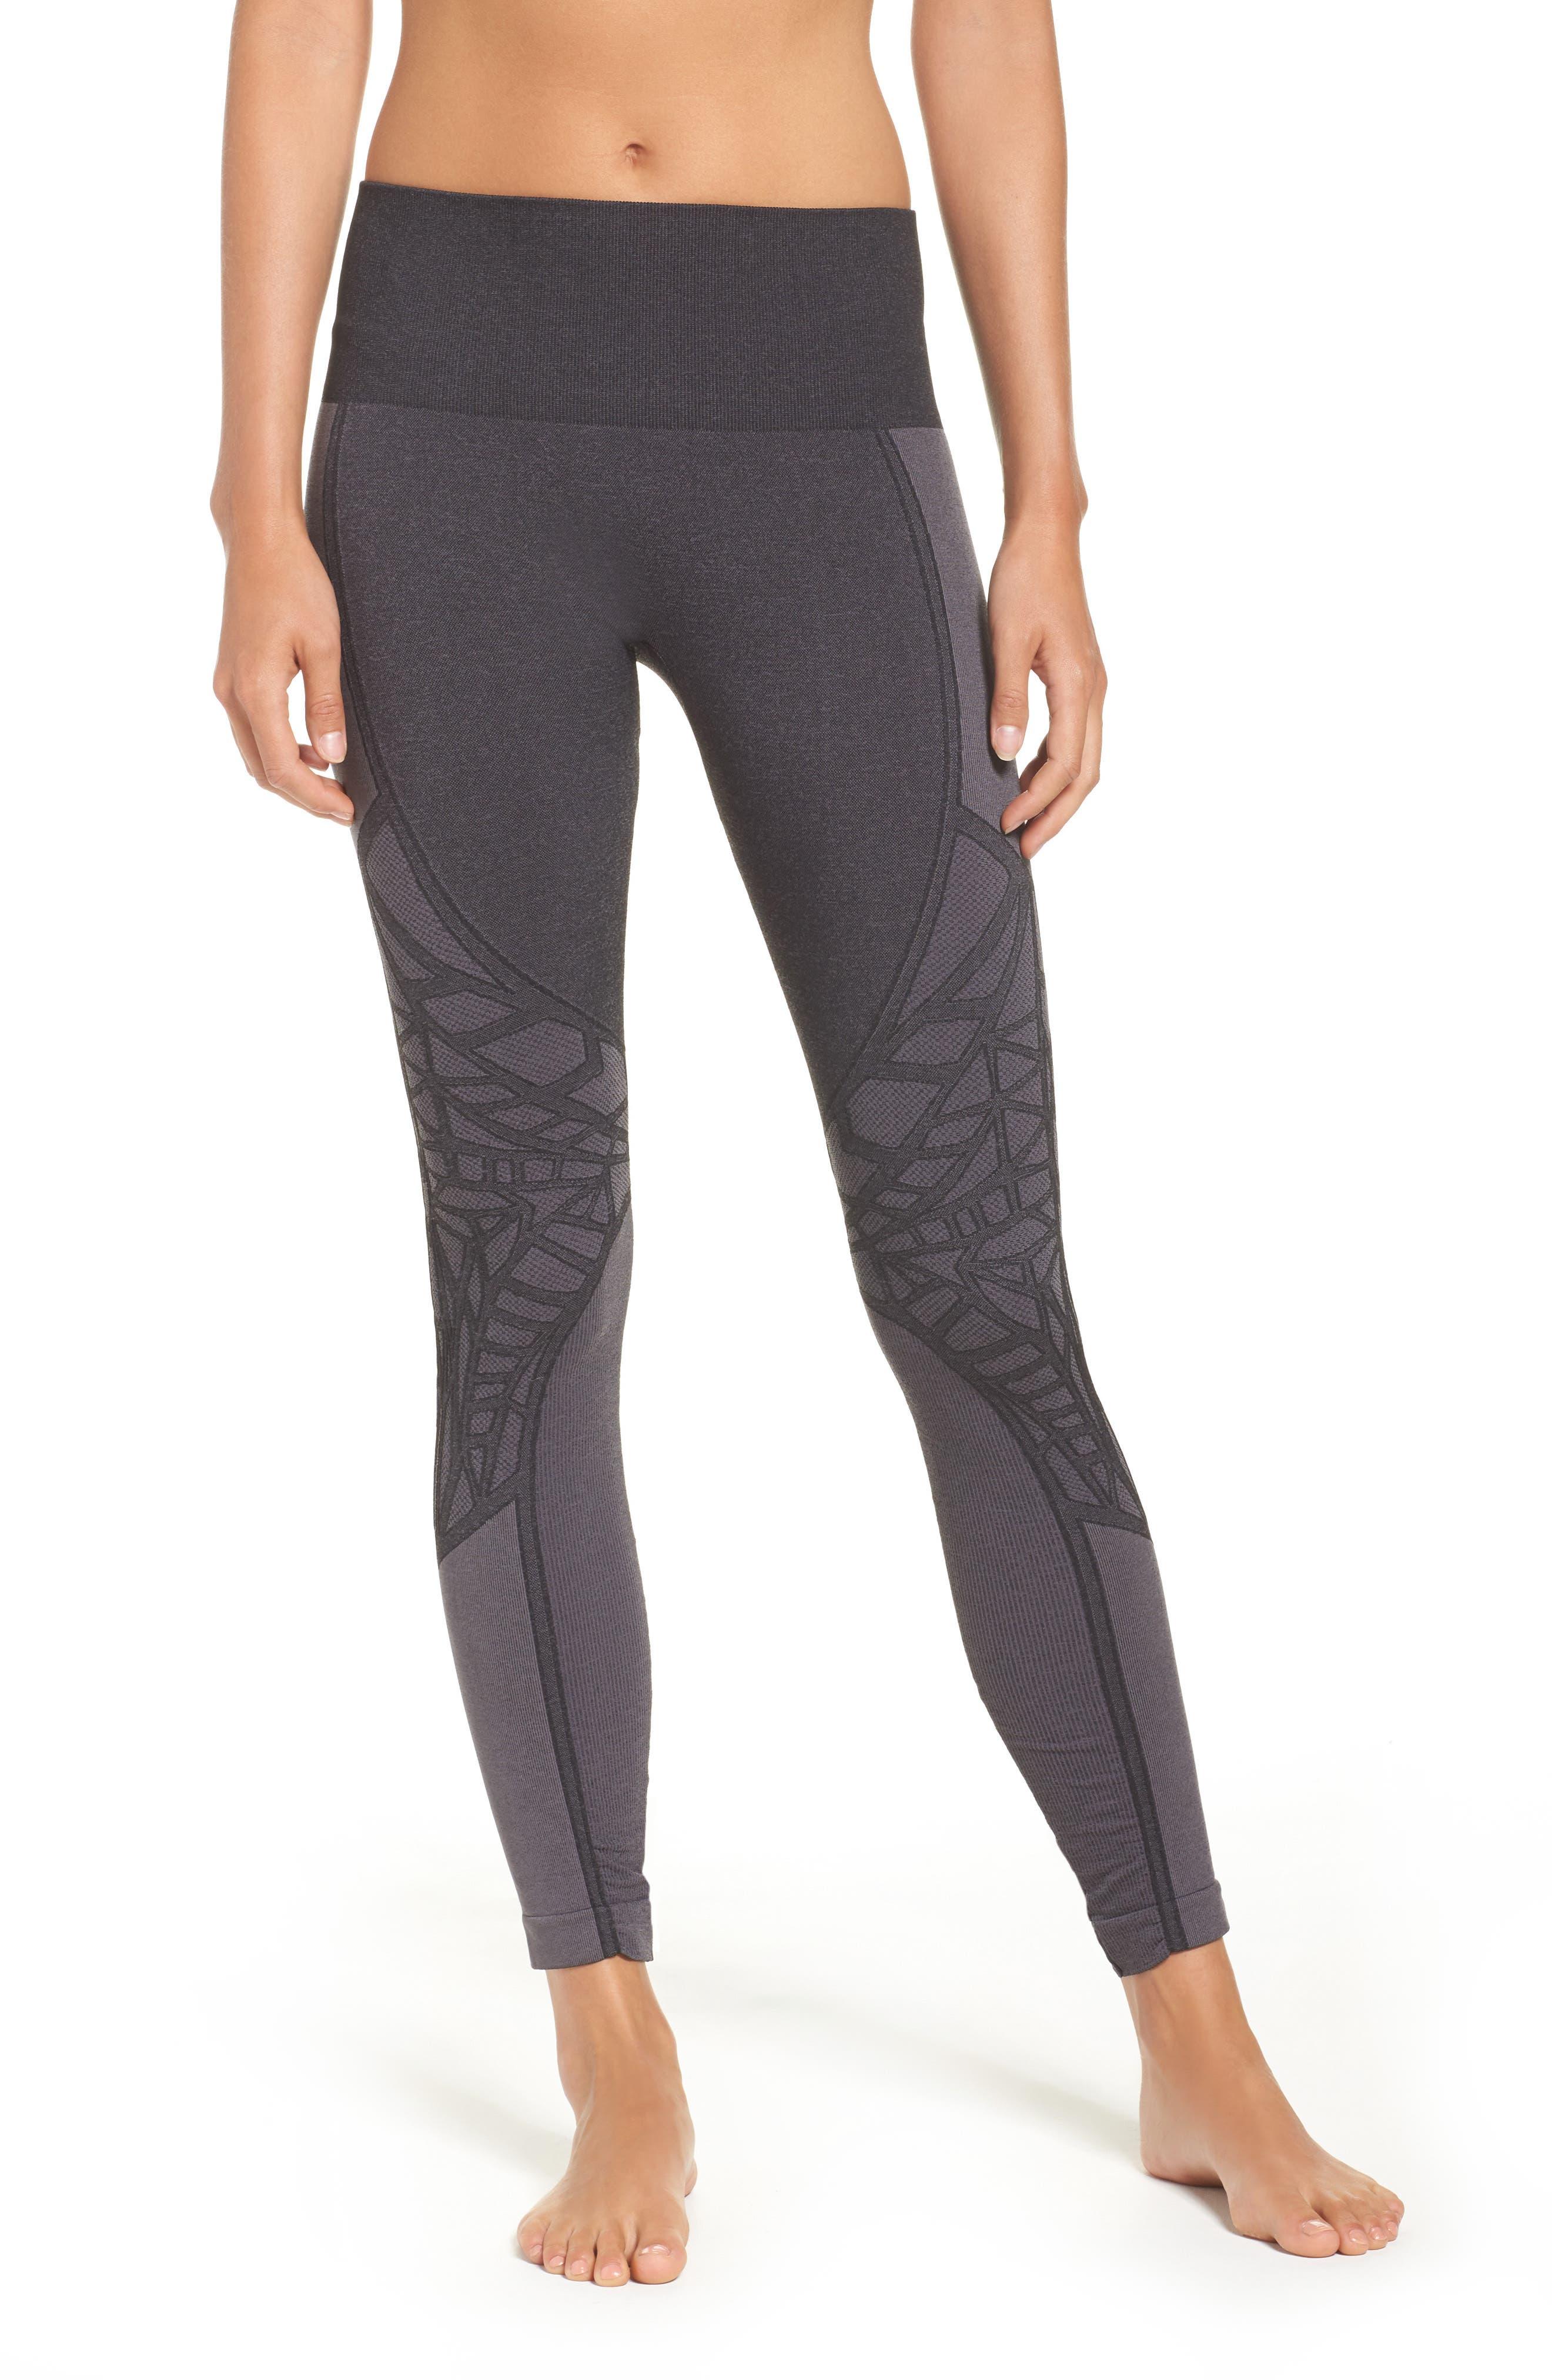 Climawear Revolution Leggings